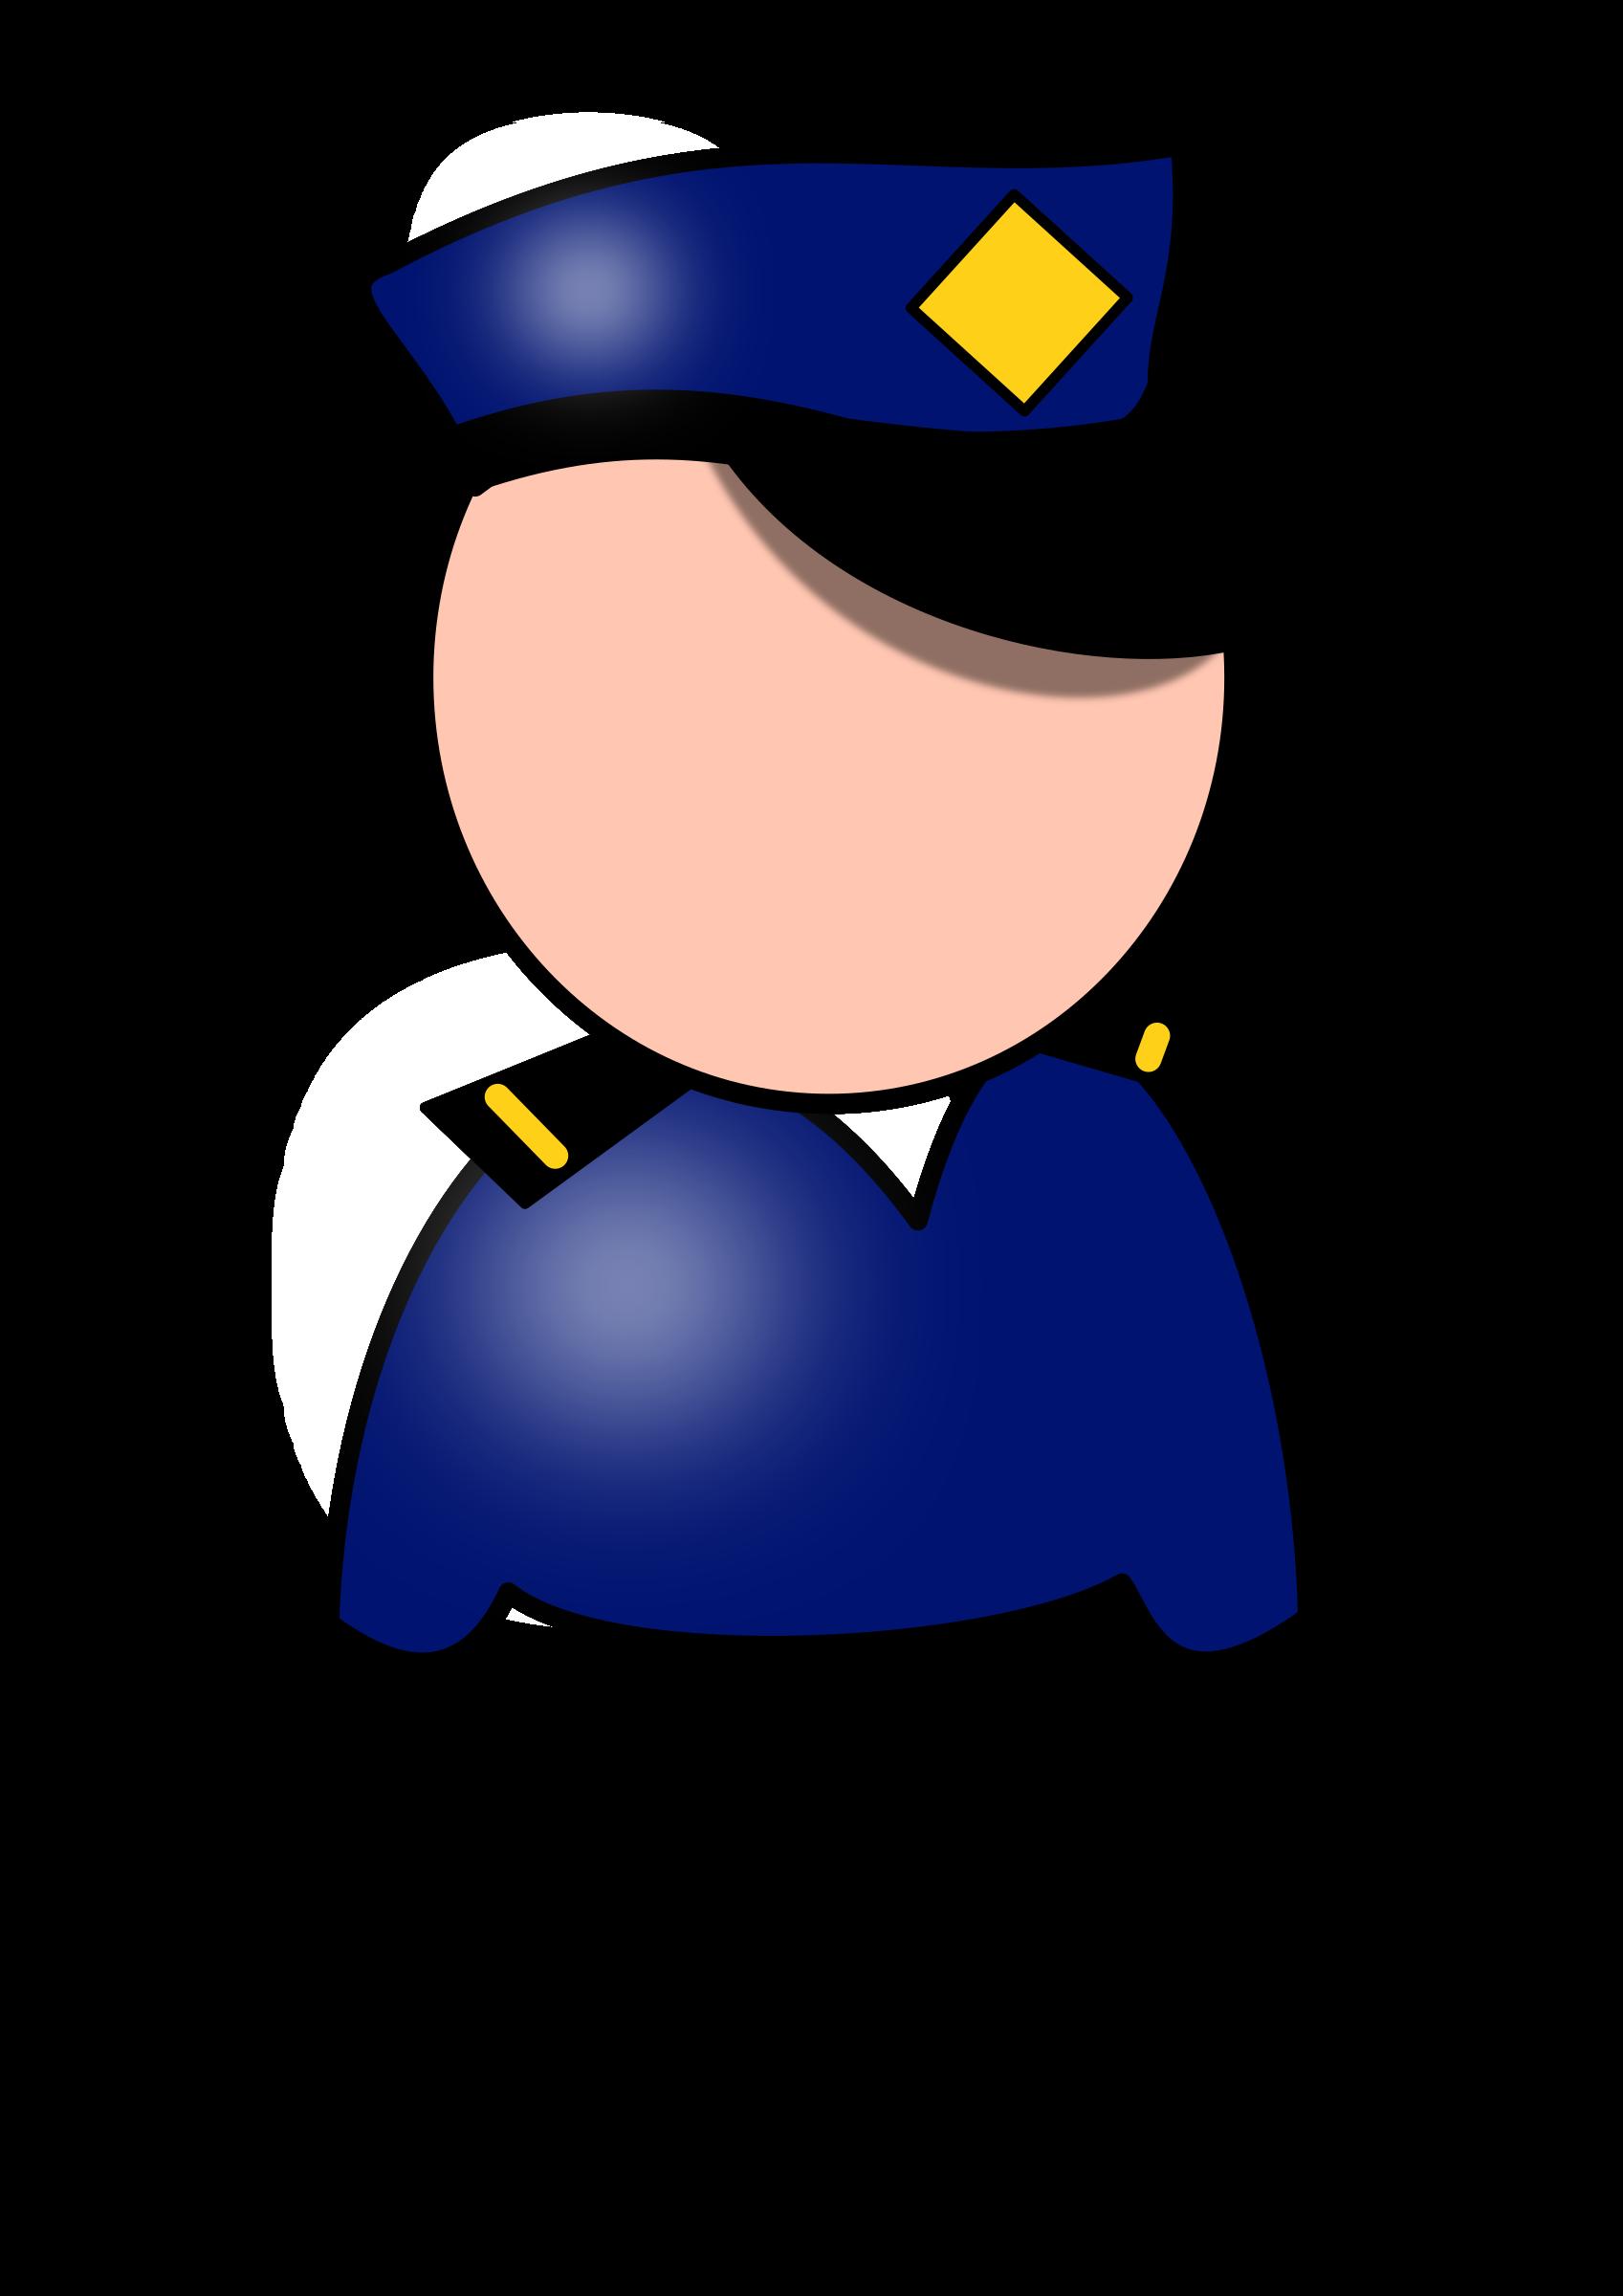 Clipart man police officer. Policeman big image png